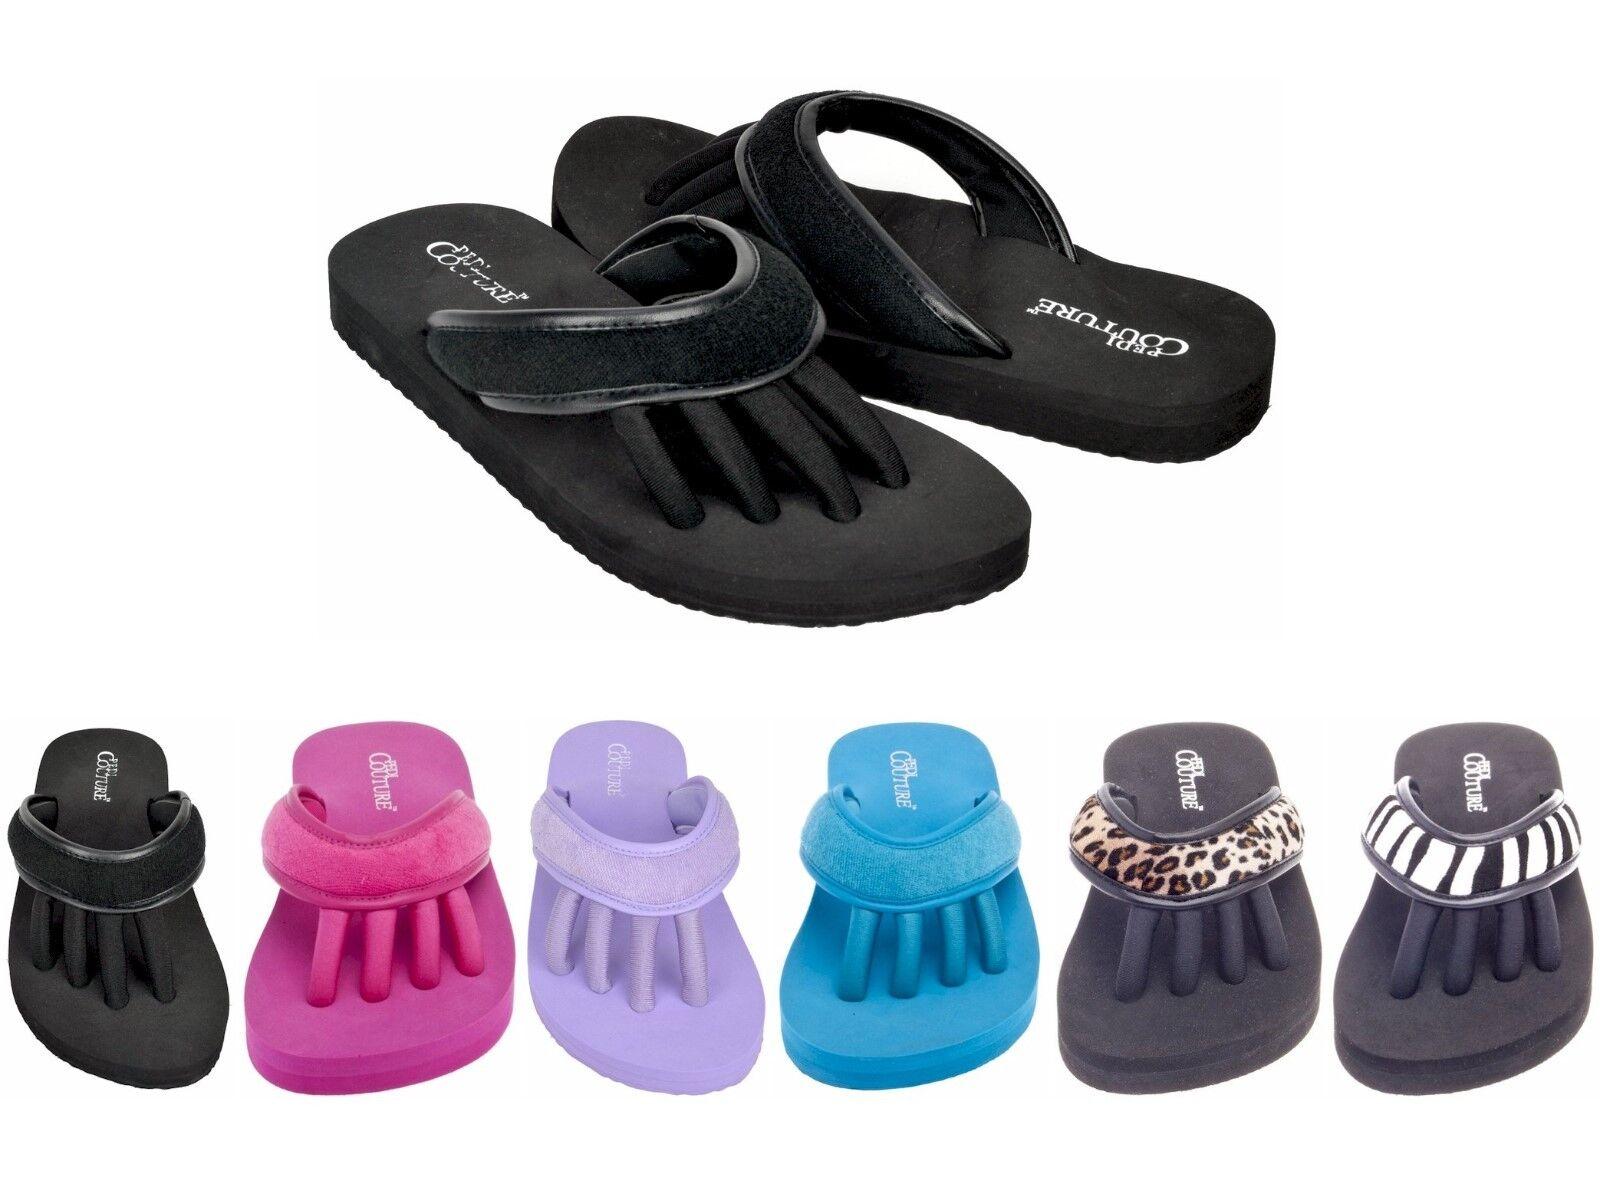 Women's Pedi Sandals Couture Pedicure Toe Separator Sandals Pedi Choose Size & Color 5b99c3